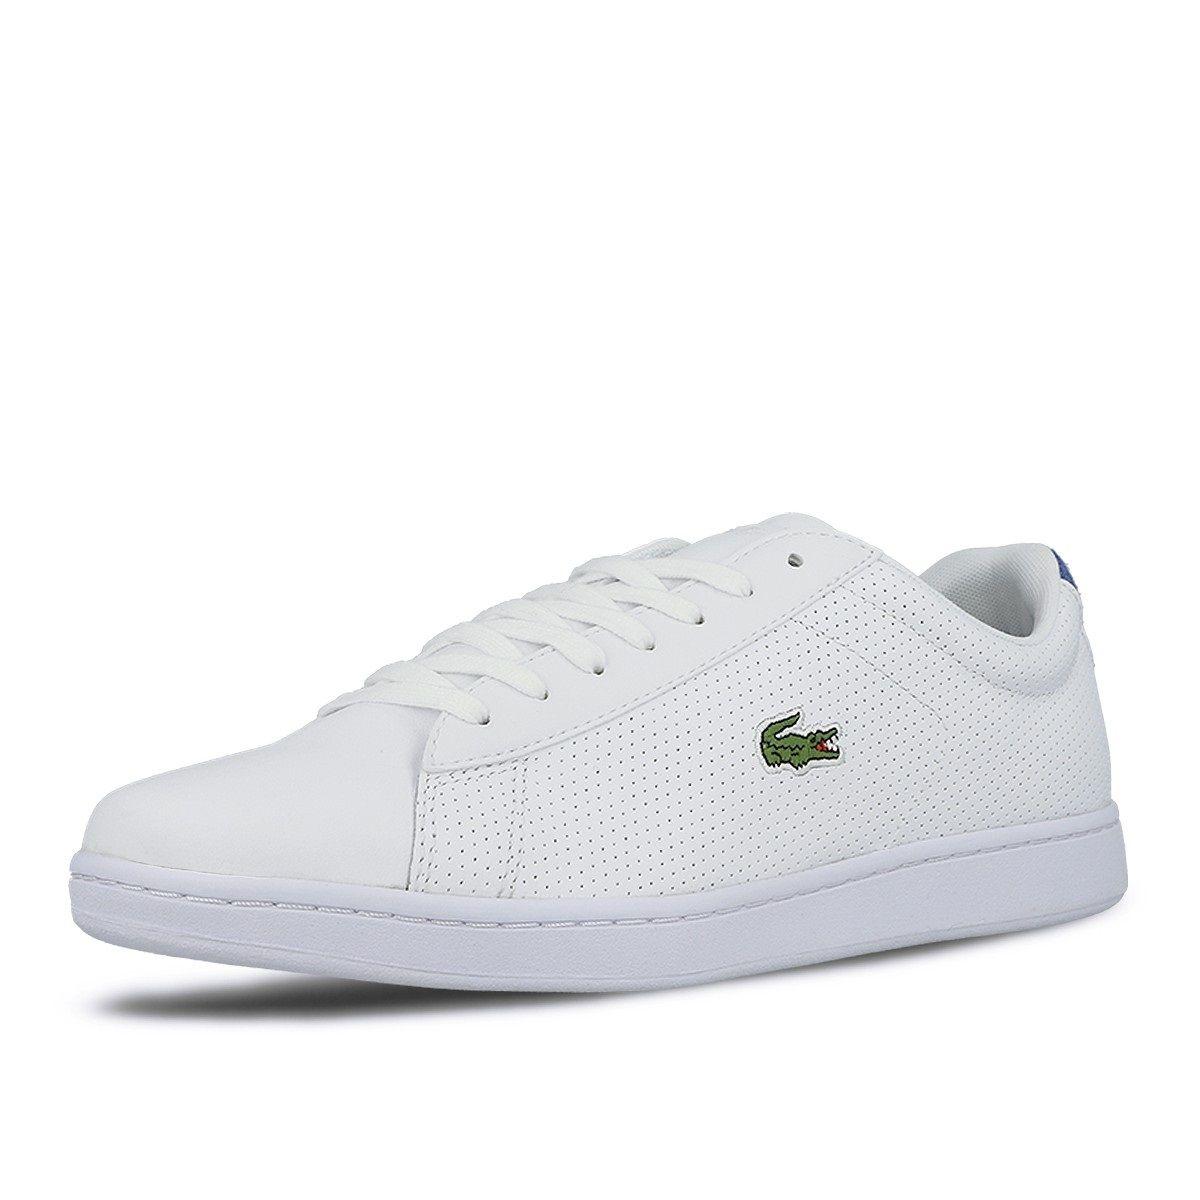 Buty Meskie Lacoste Carnaby Evo 217 Roz 40 5 6854042002 Oficjalne Archiwum Allegro Lacoste Converse Sneaker Wedding Sneaker